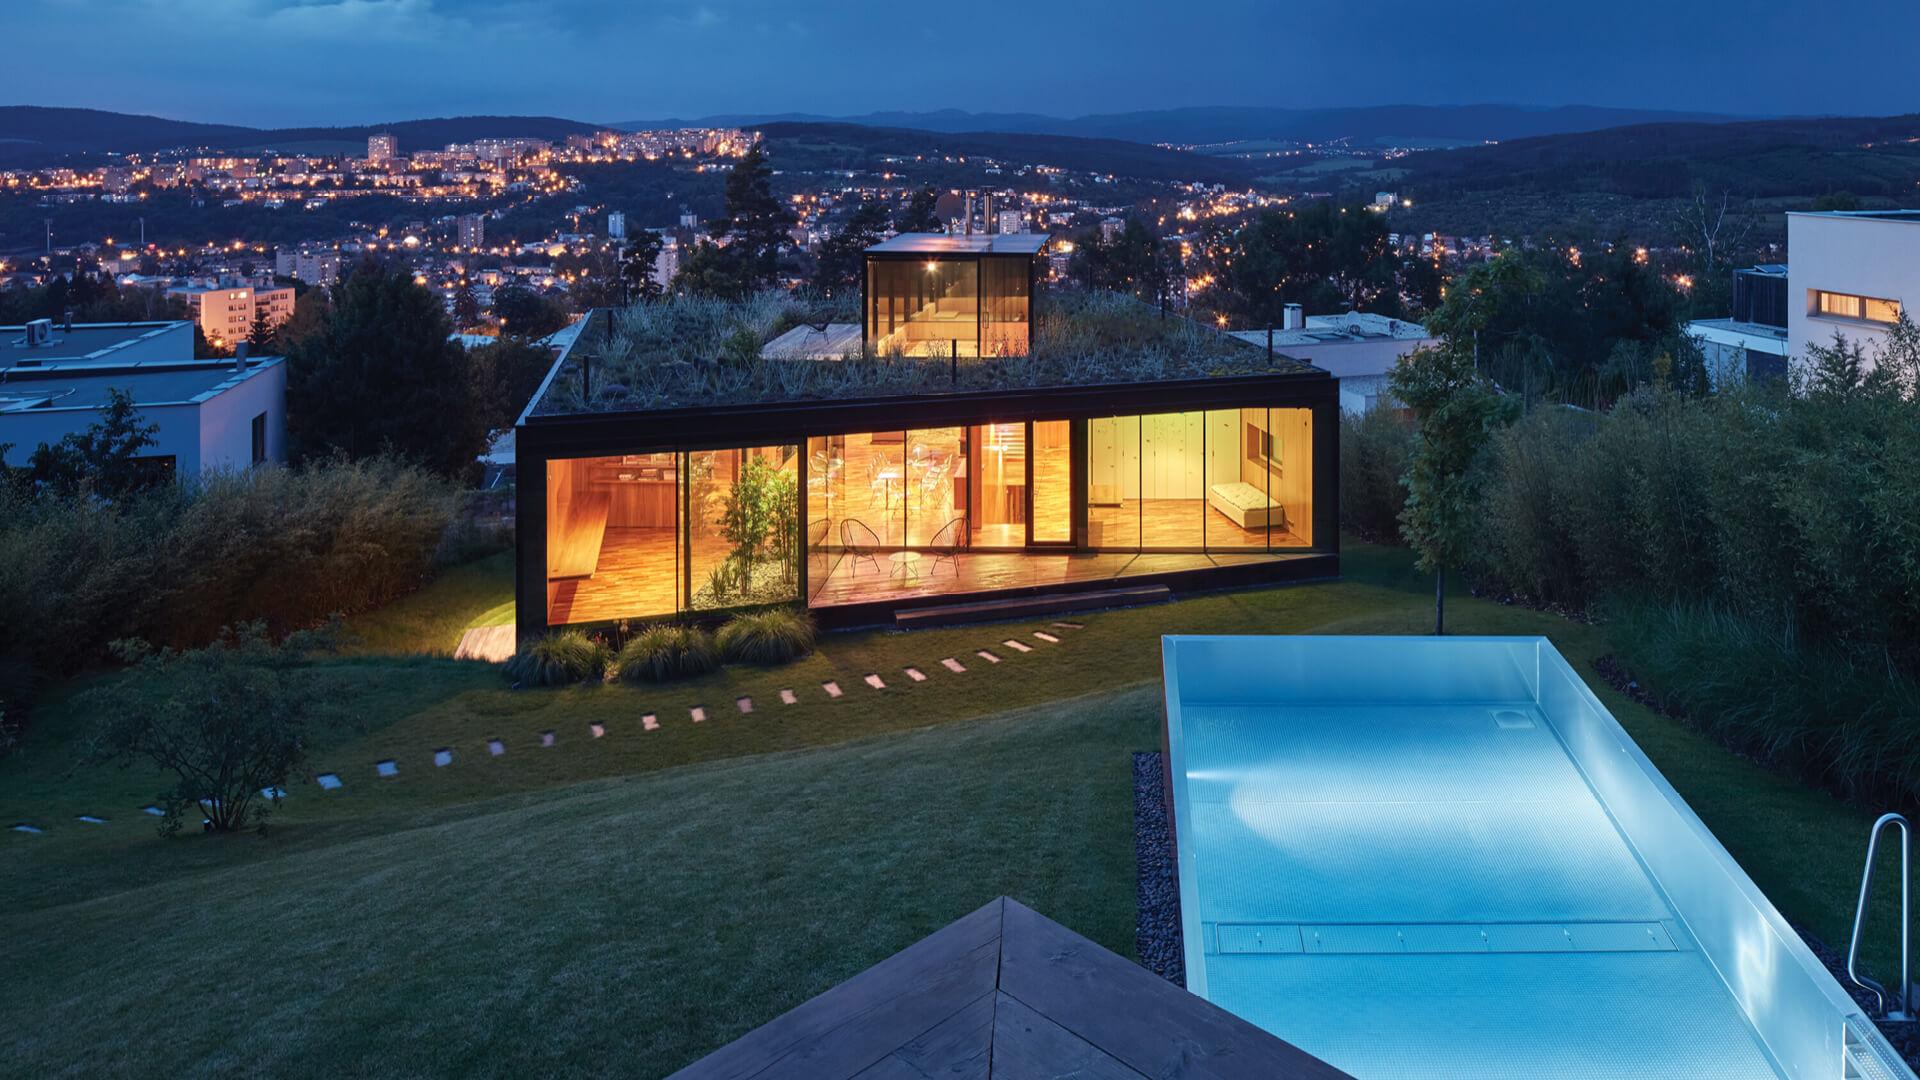 Lazy House by petrjanda/brainwork tie in a home, a garden, and the Czech city of Zlín